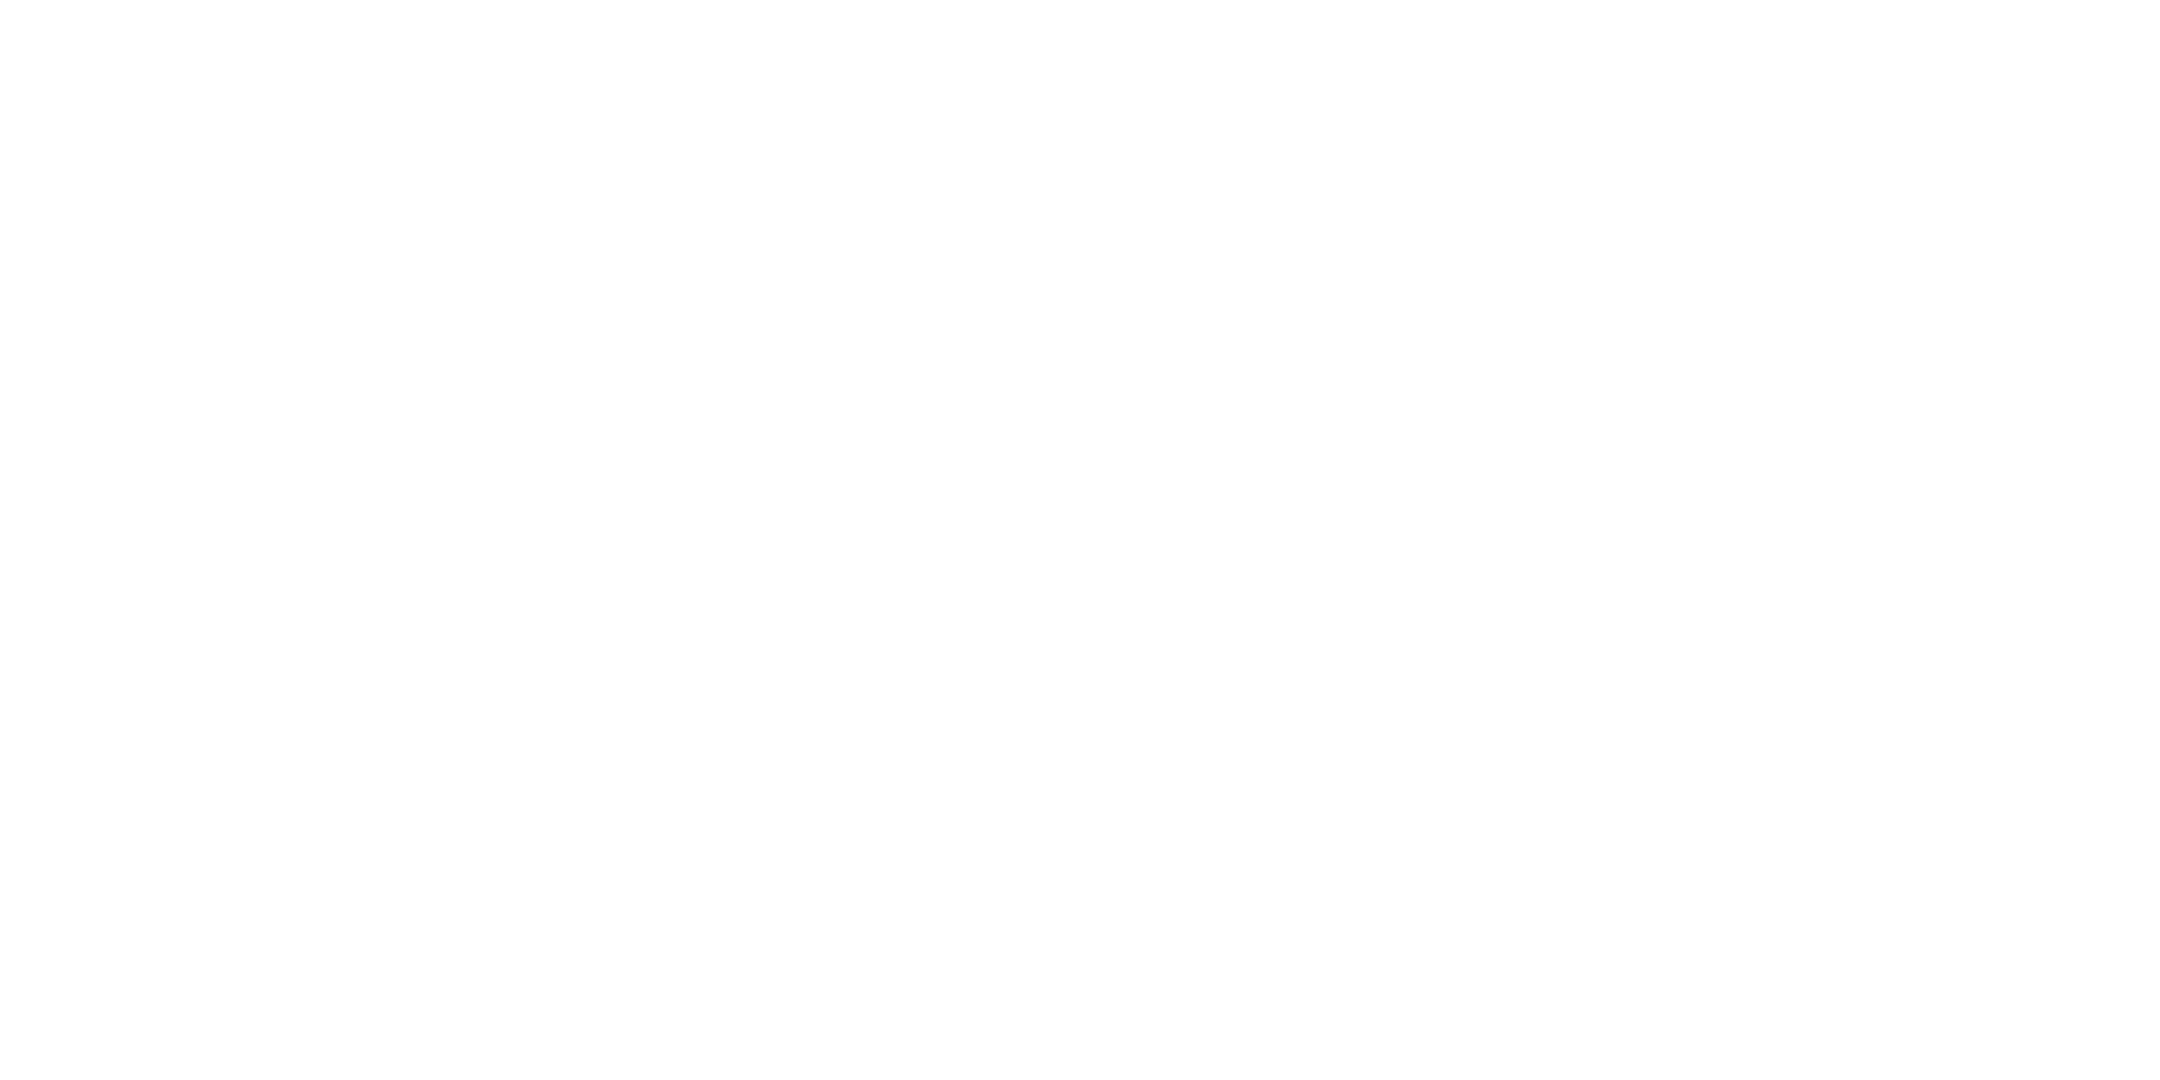 QCF LogoTwitter@2x.png